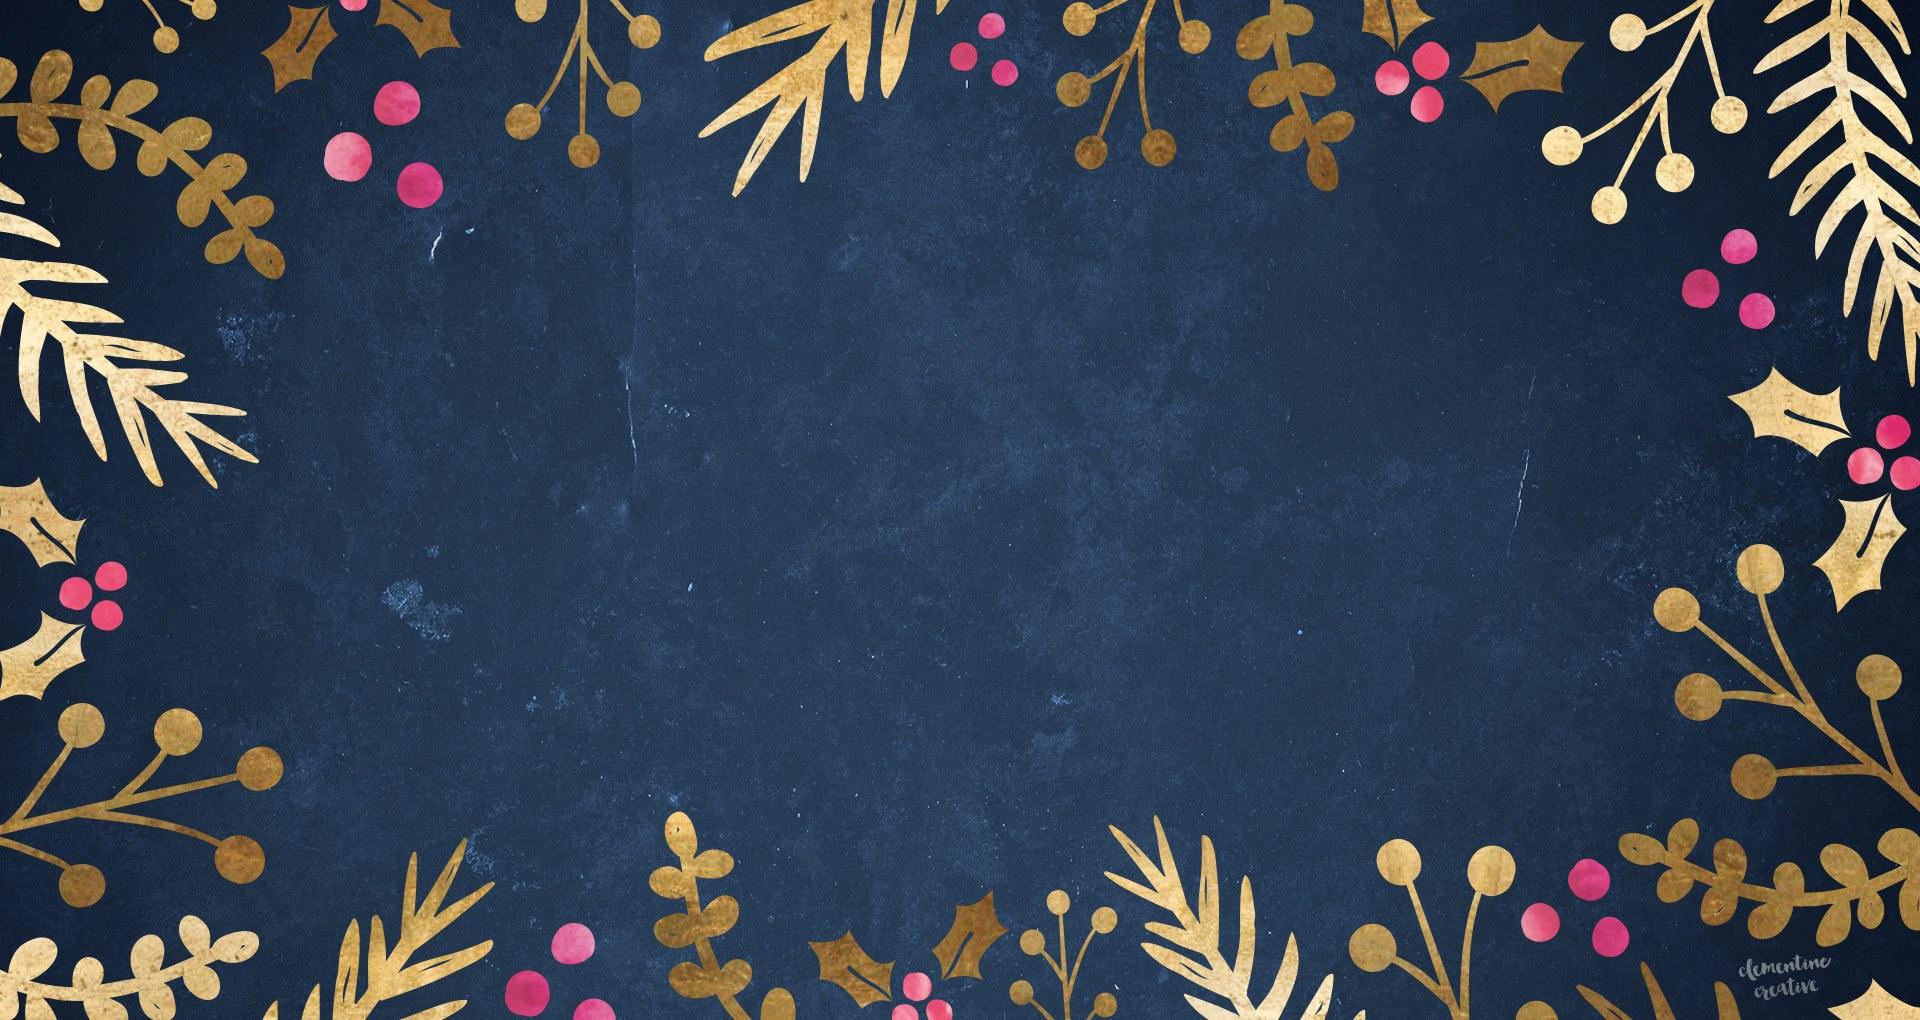 Foil foliage desktop